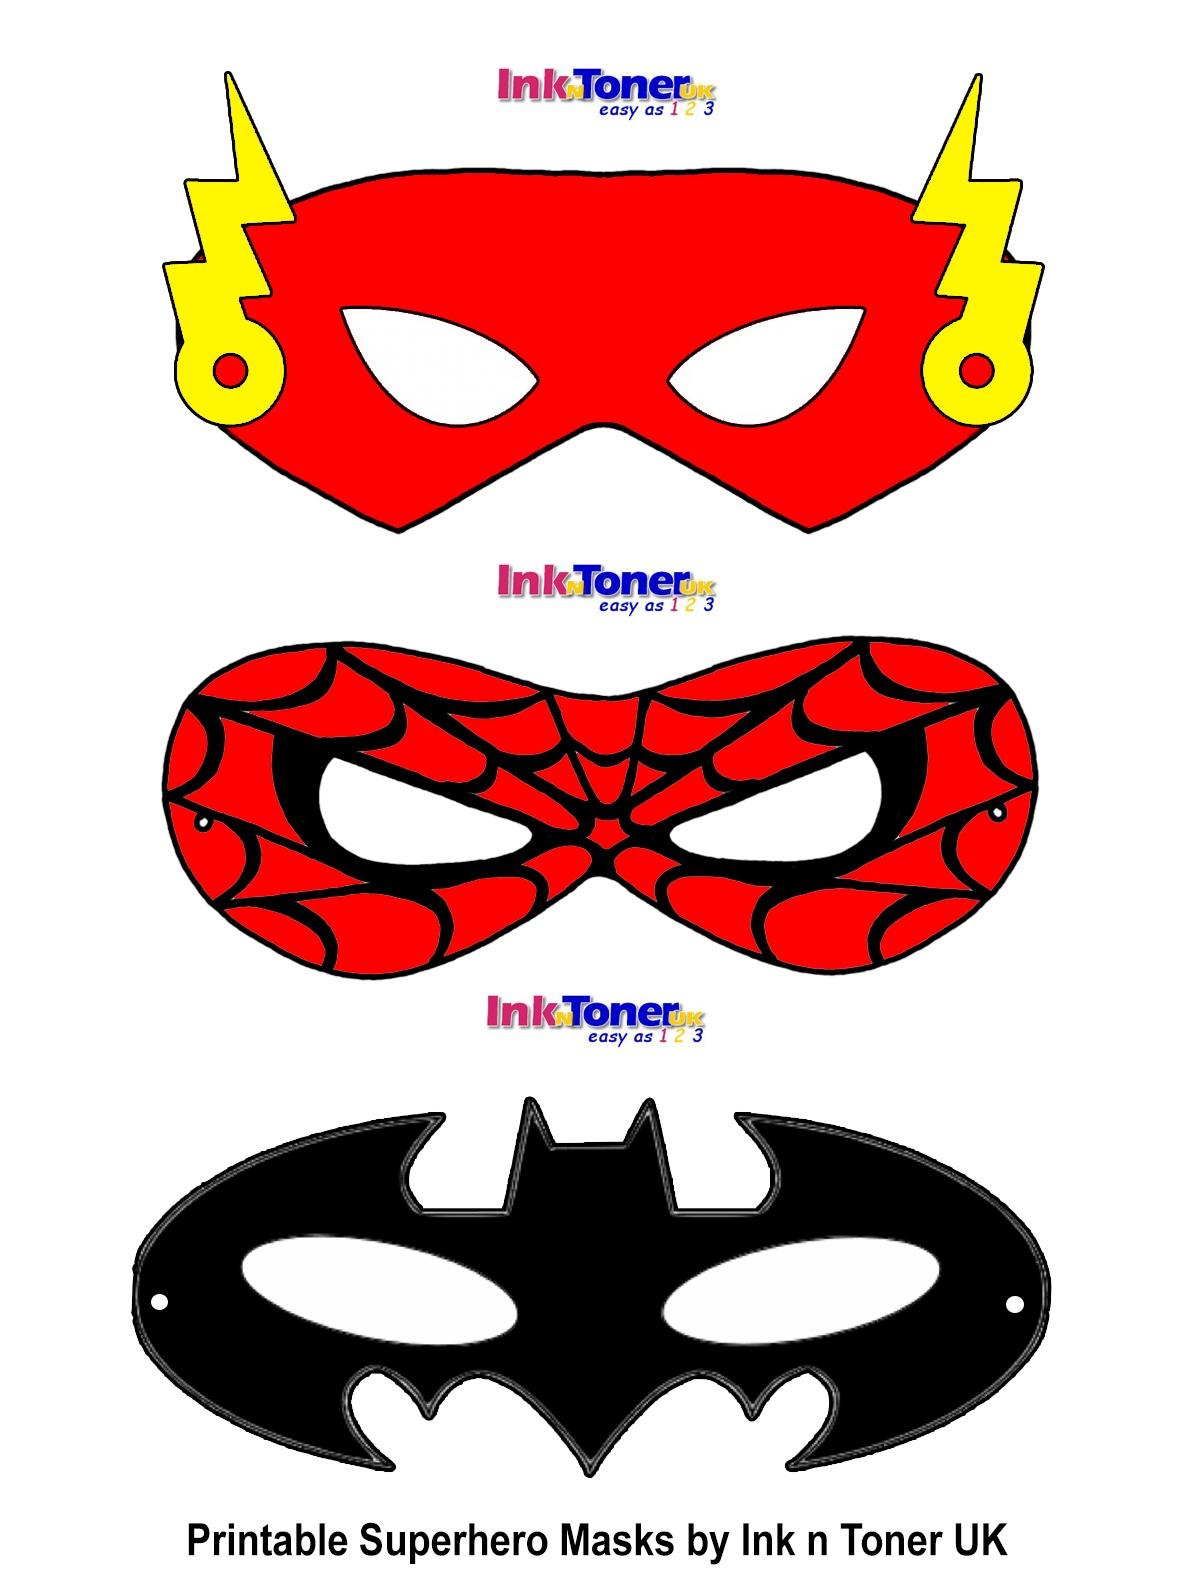 Printable Superhero Masks For Super Hero Day   Inkntoneruk Blog - Superman Mask Printable Free